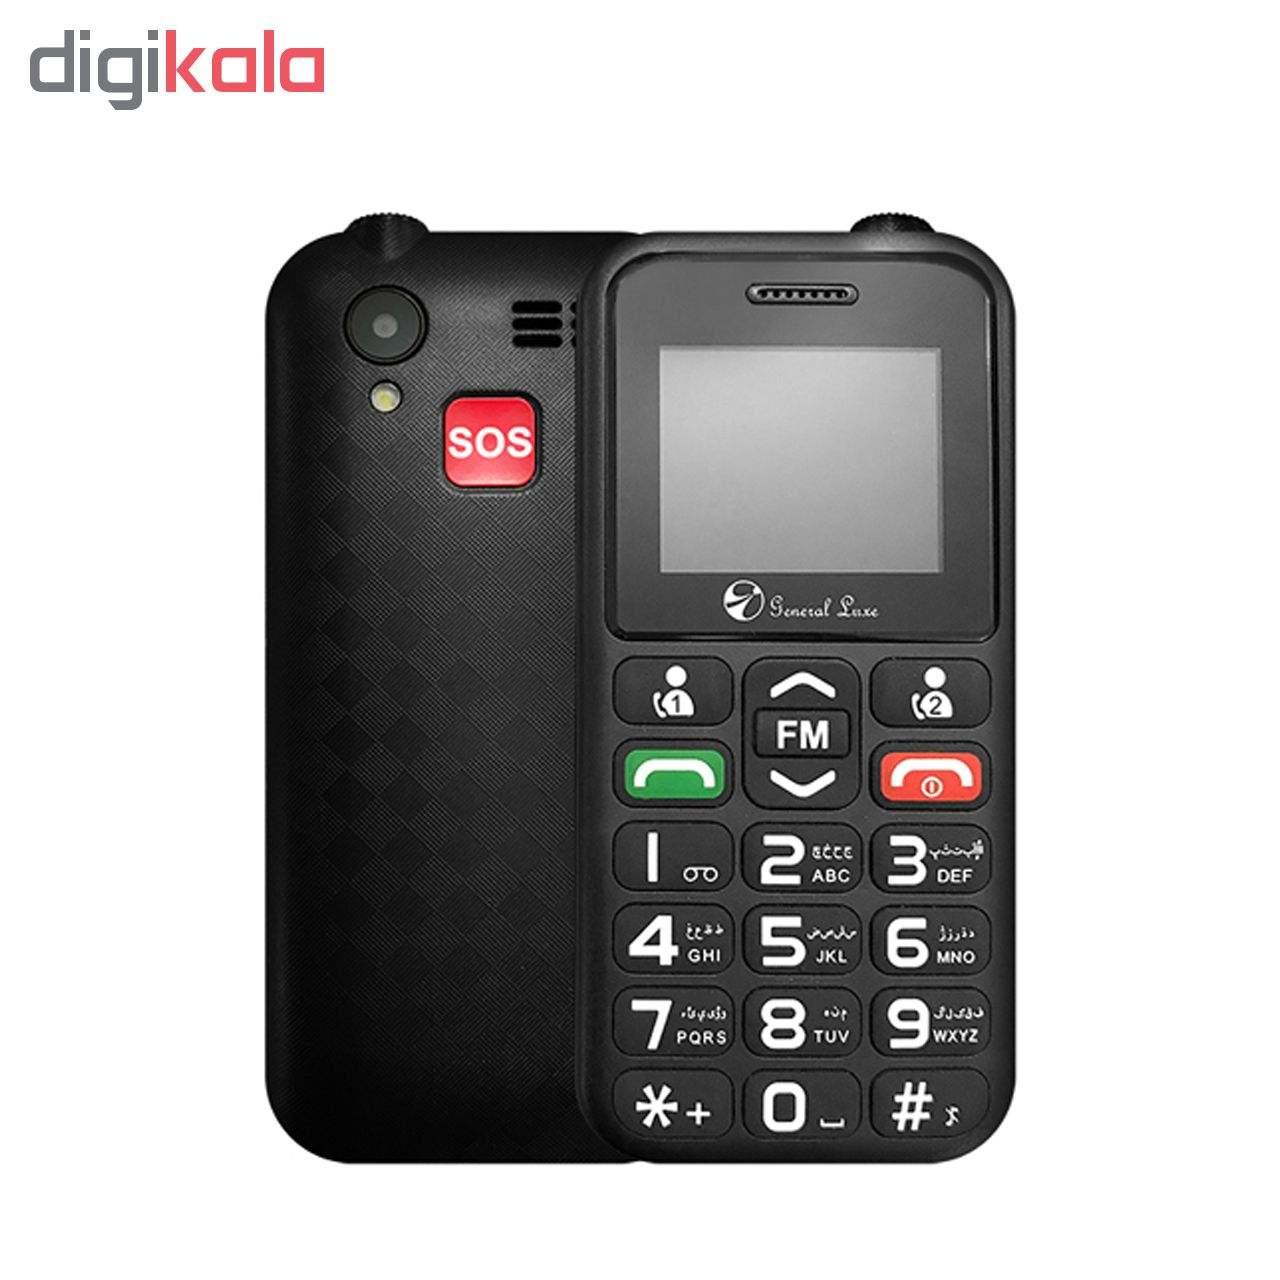 گوشی موبایل جی ال ایکس مدل General Luxe P3 دو سیم کارت thumb 2